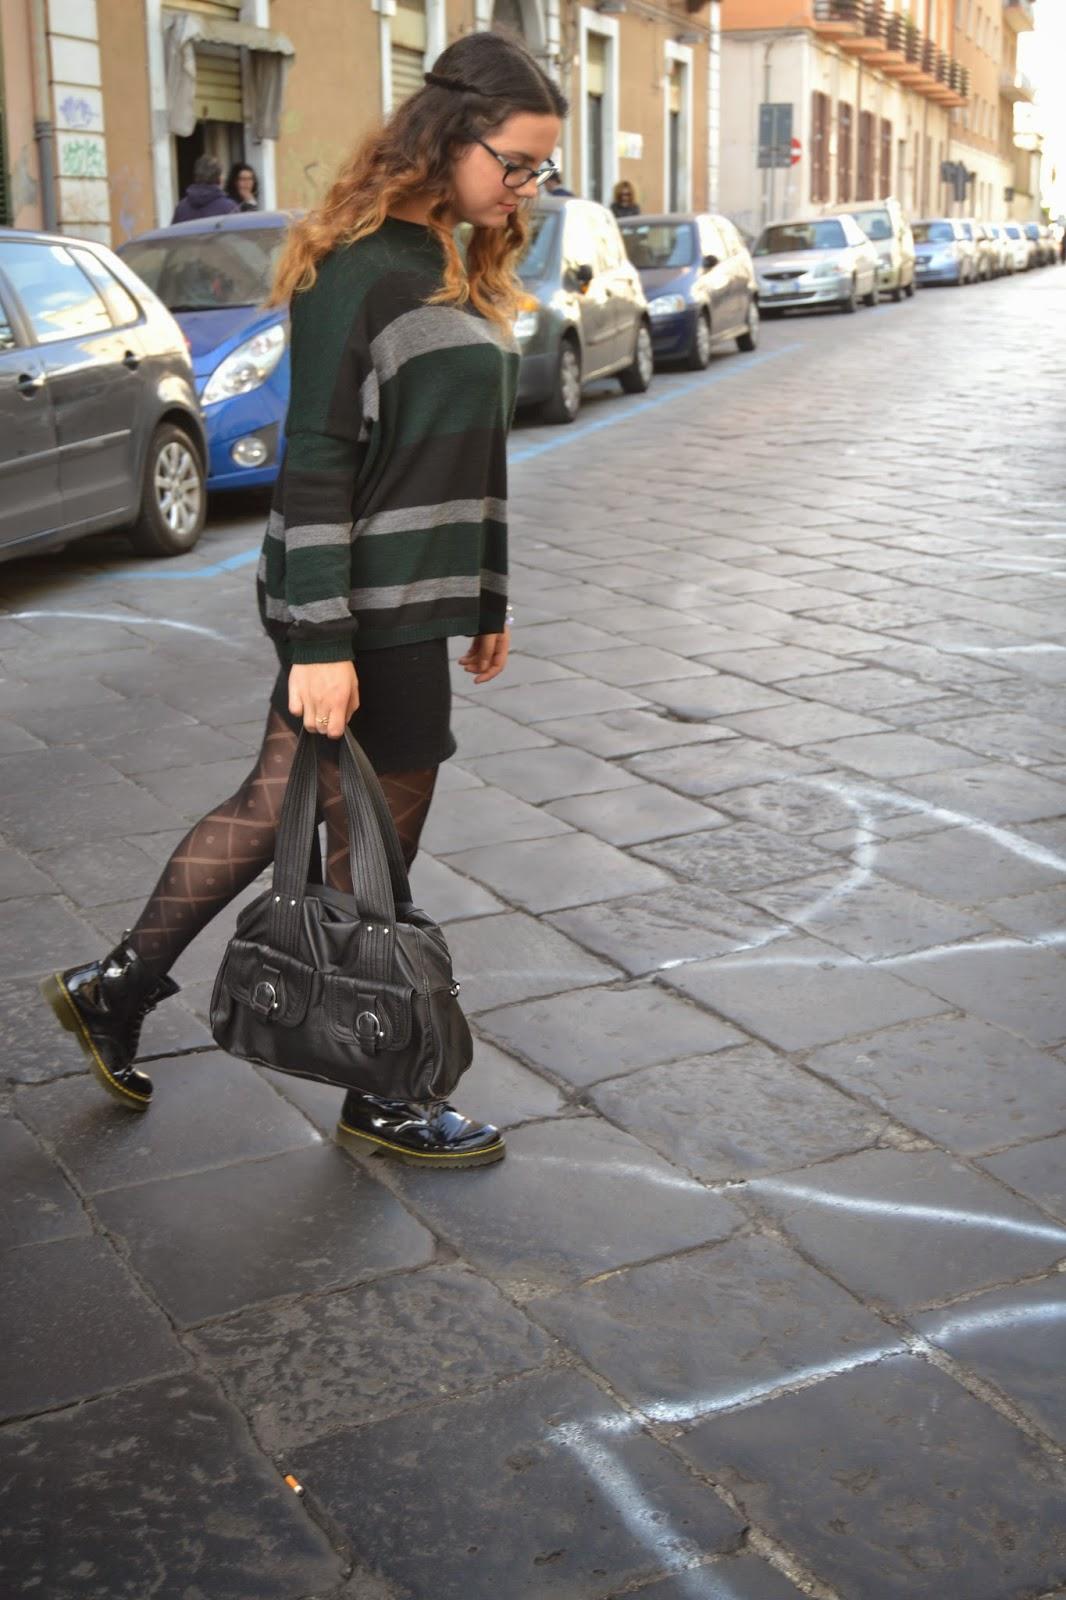 ootd outfit fashion blog tumblr girl bang orange hair zairadurso fashion's obsessions instagram zaira d'urso